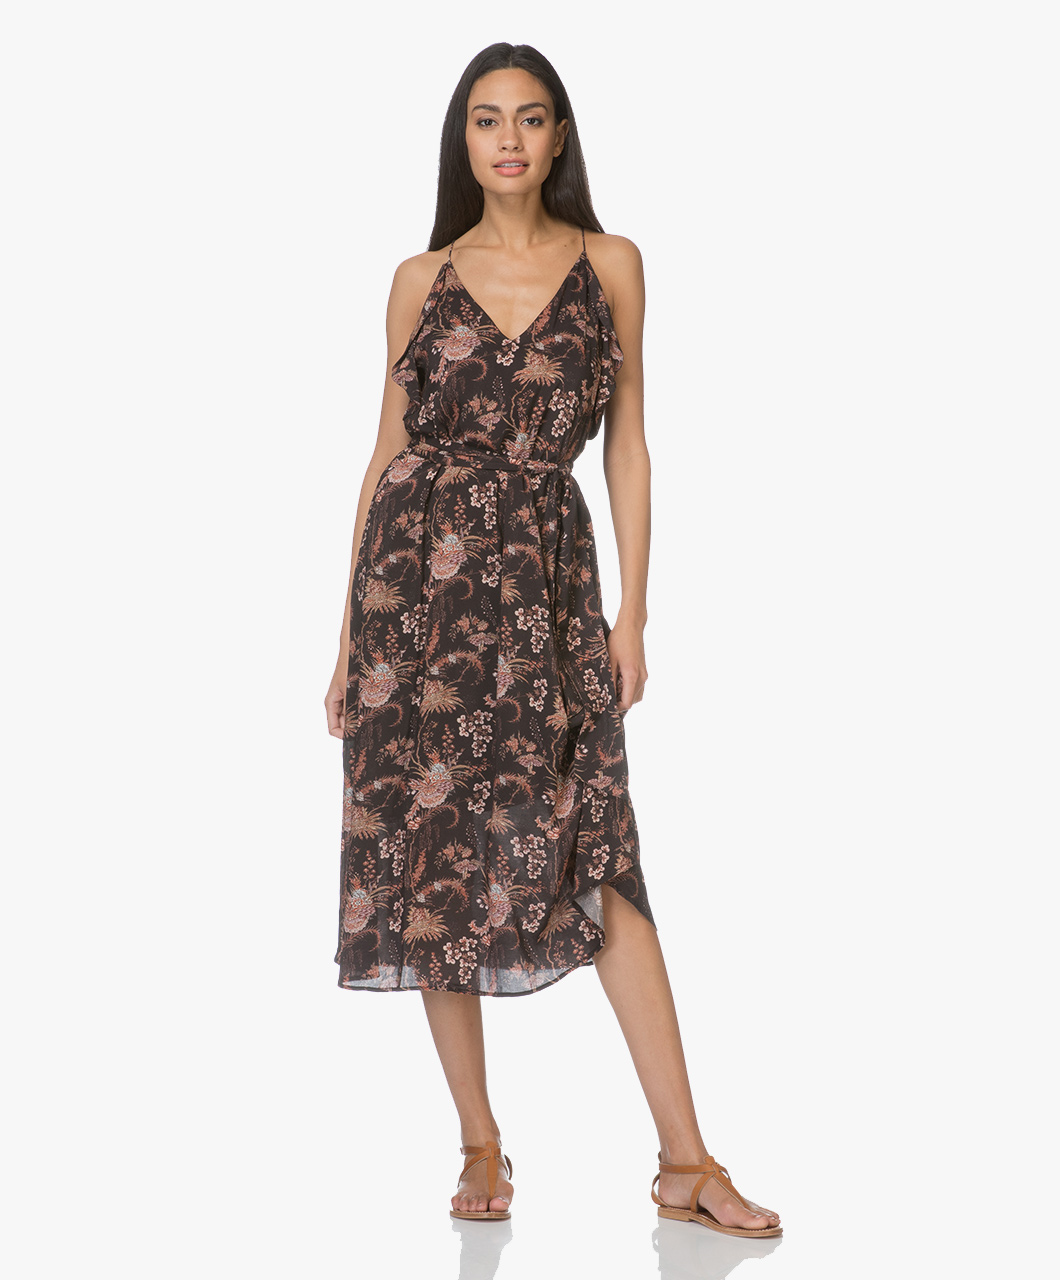 ffd219e3fd91b Magali Pascal Whisper Viscose Print Ruffle Dress - Black Valence - whisper  dress print valence